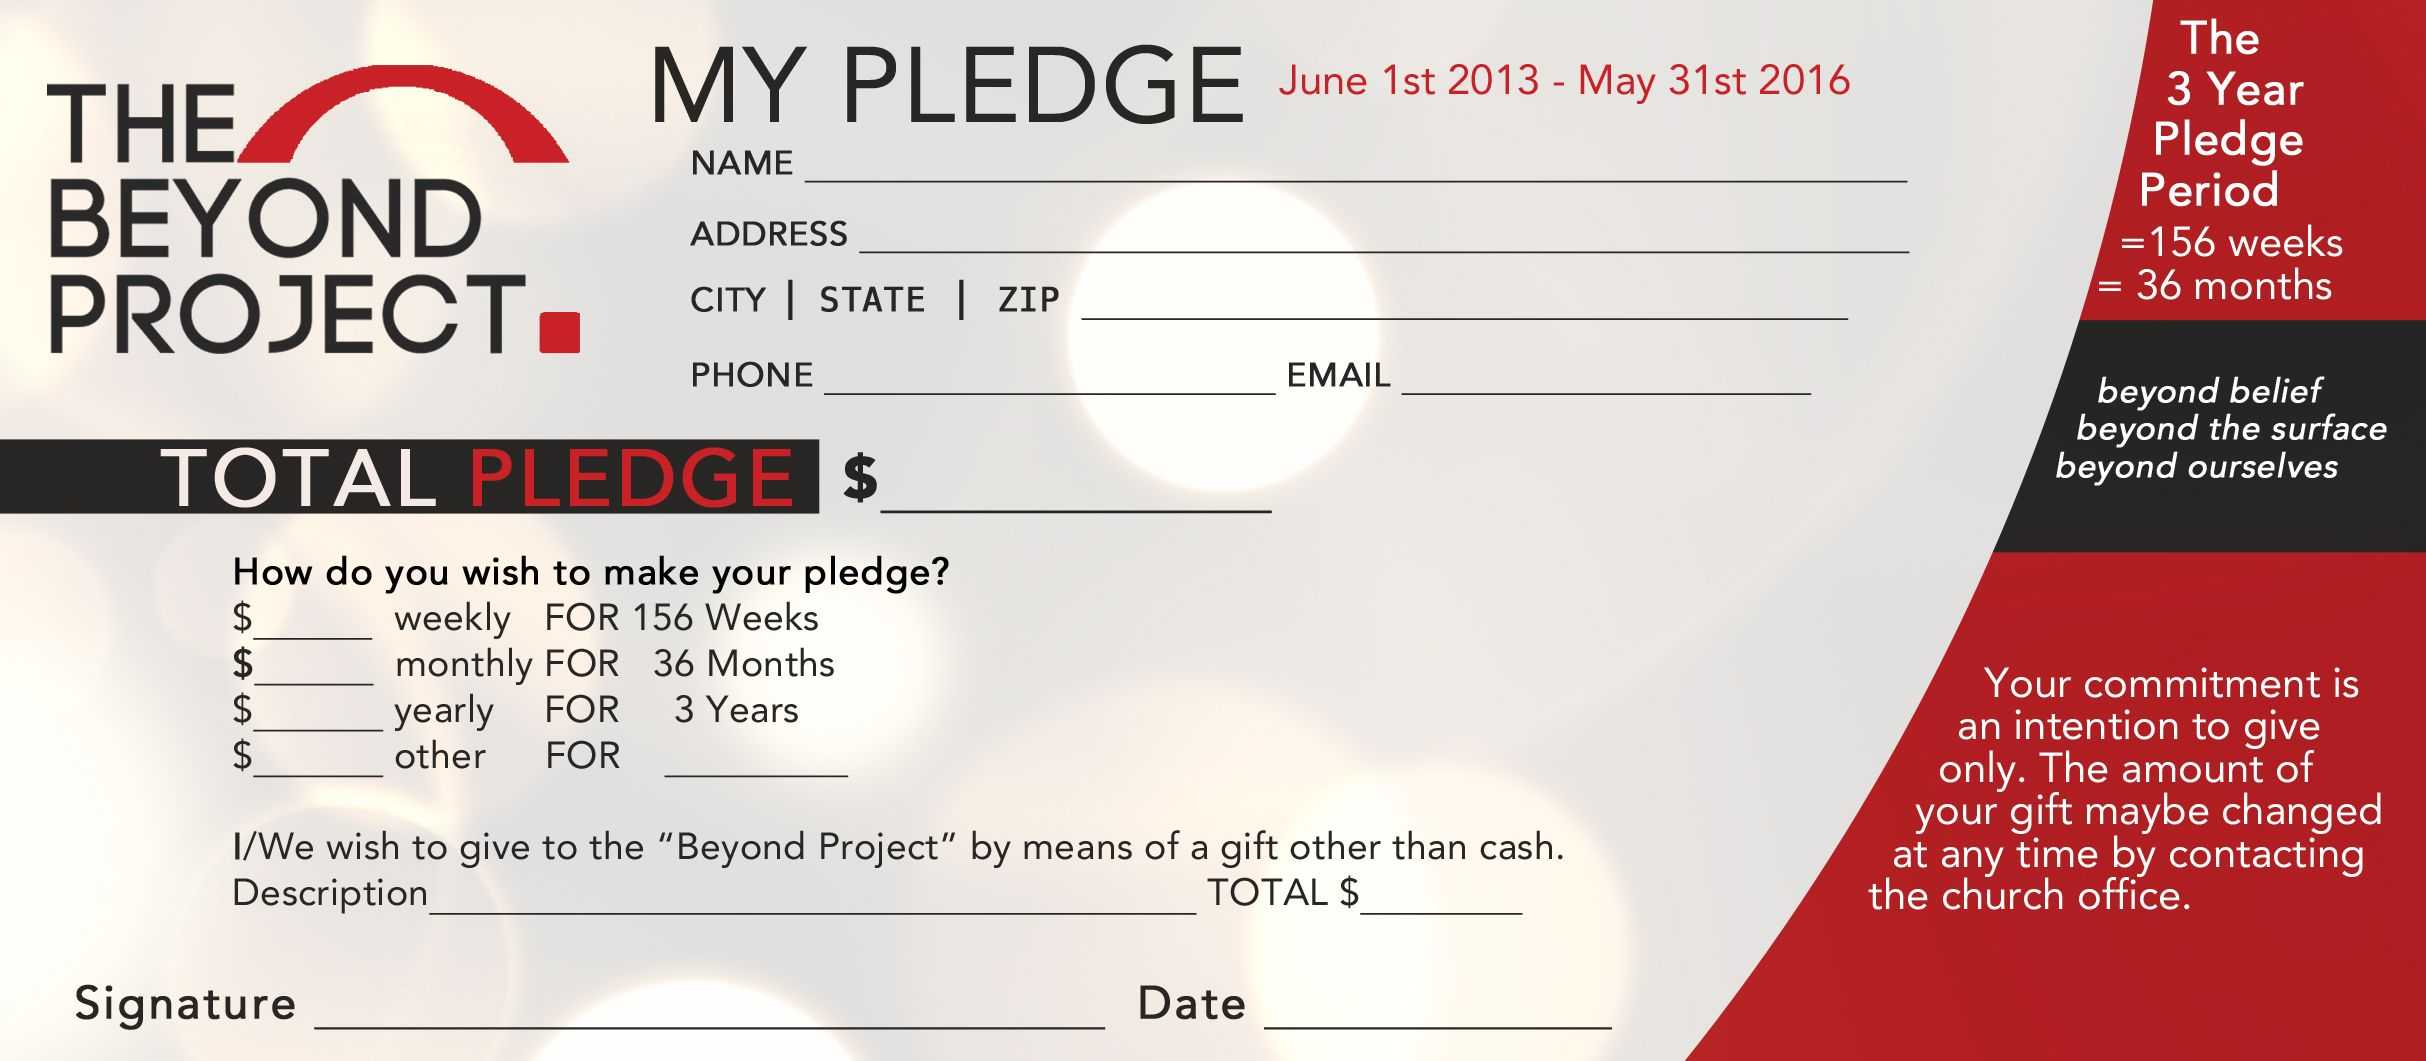 Church Pledge Form Template Hausn3Uc | Capital Campaign Throughout Pledge Card Template For Church